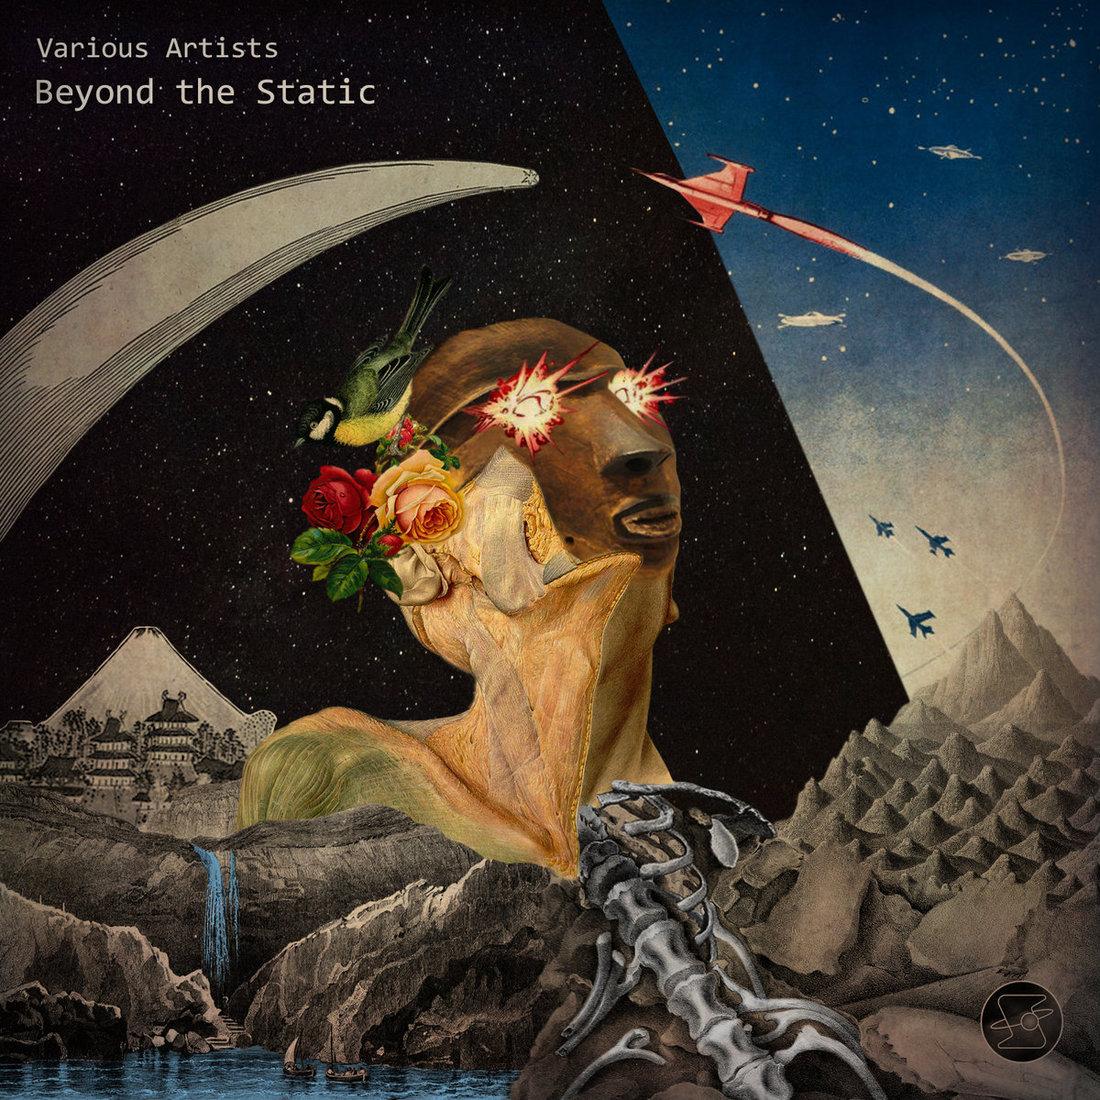 V.A. - Beyond the Static (Soundsphere)